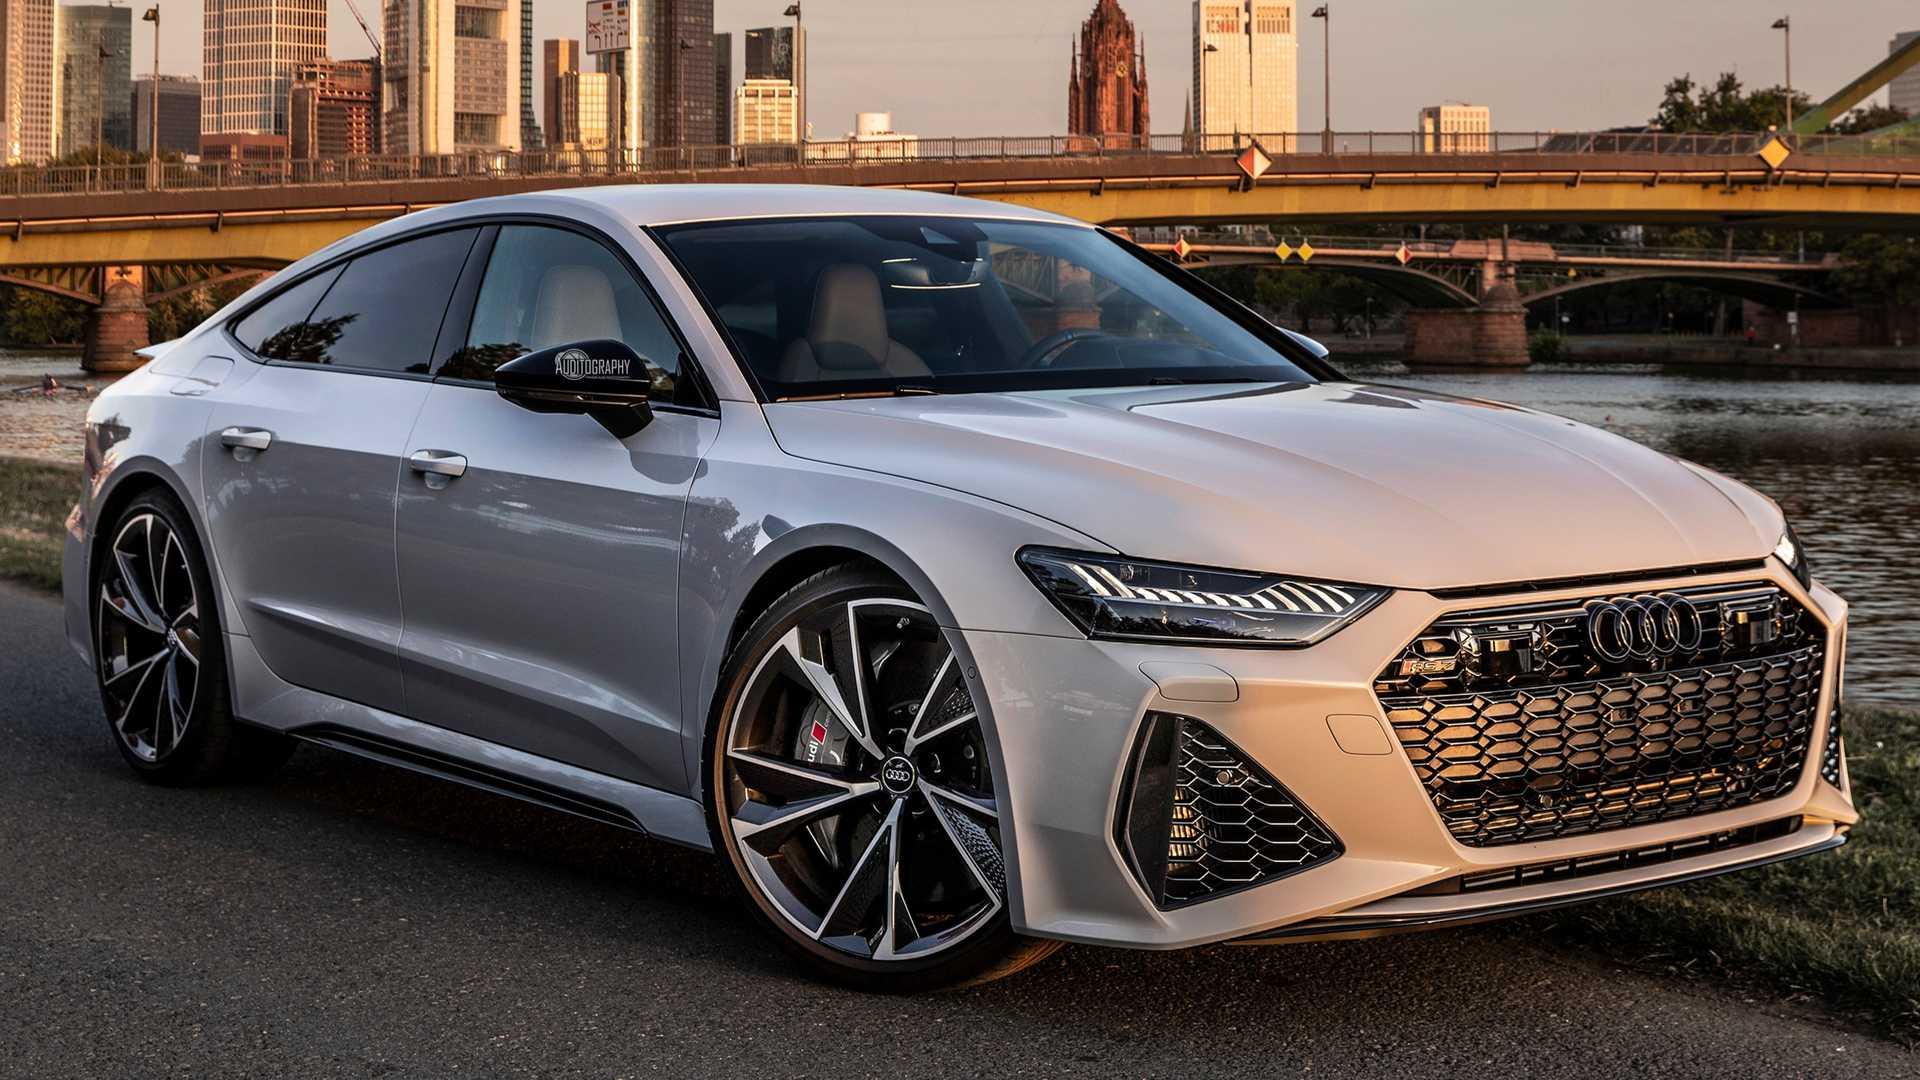 Audi_banner